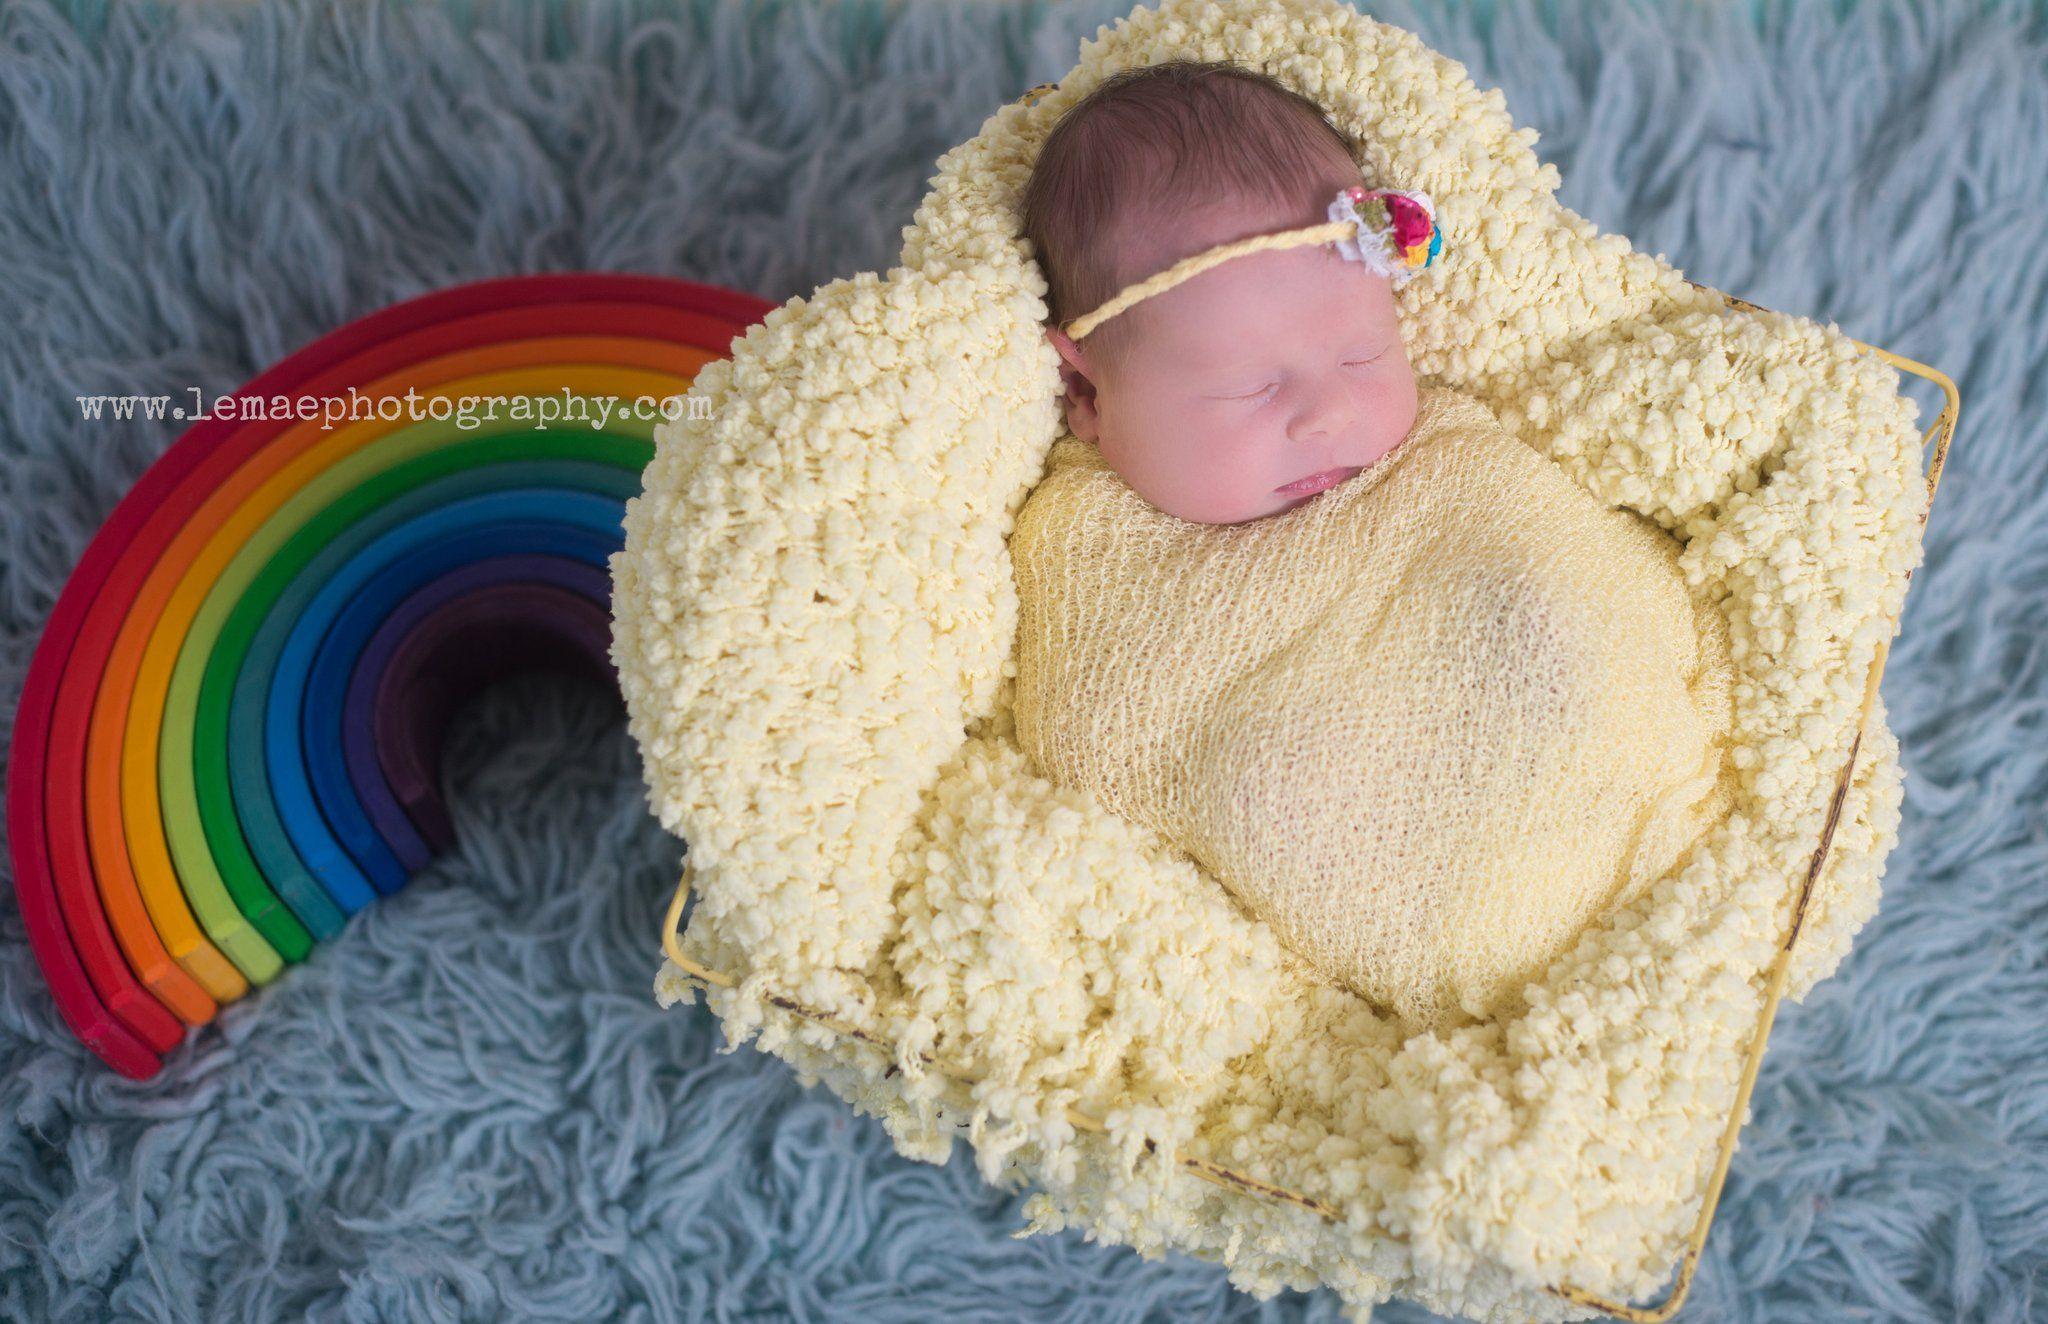 Rainbow baby photo ideas popsugar moms